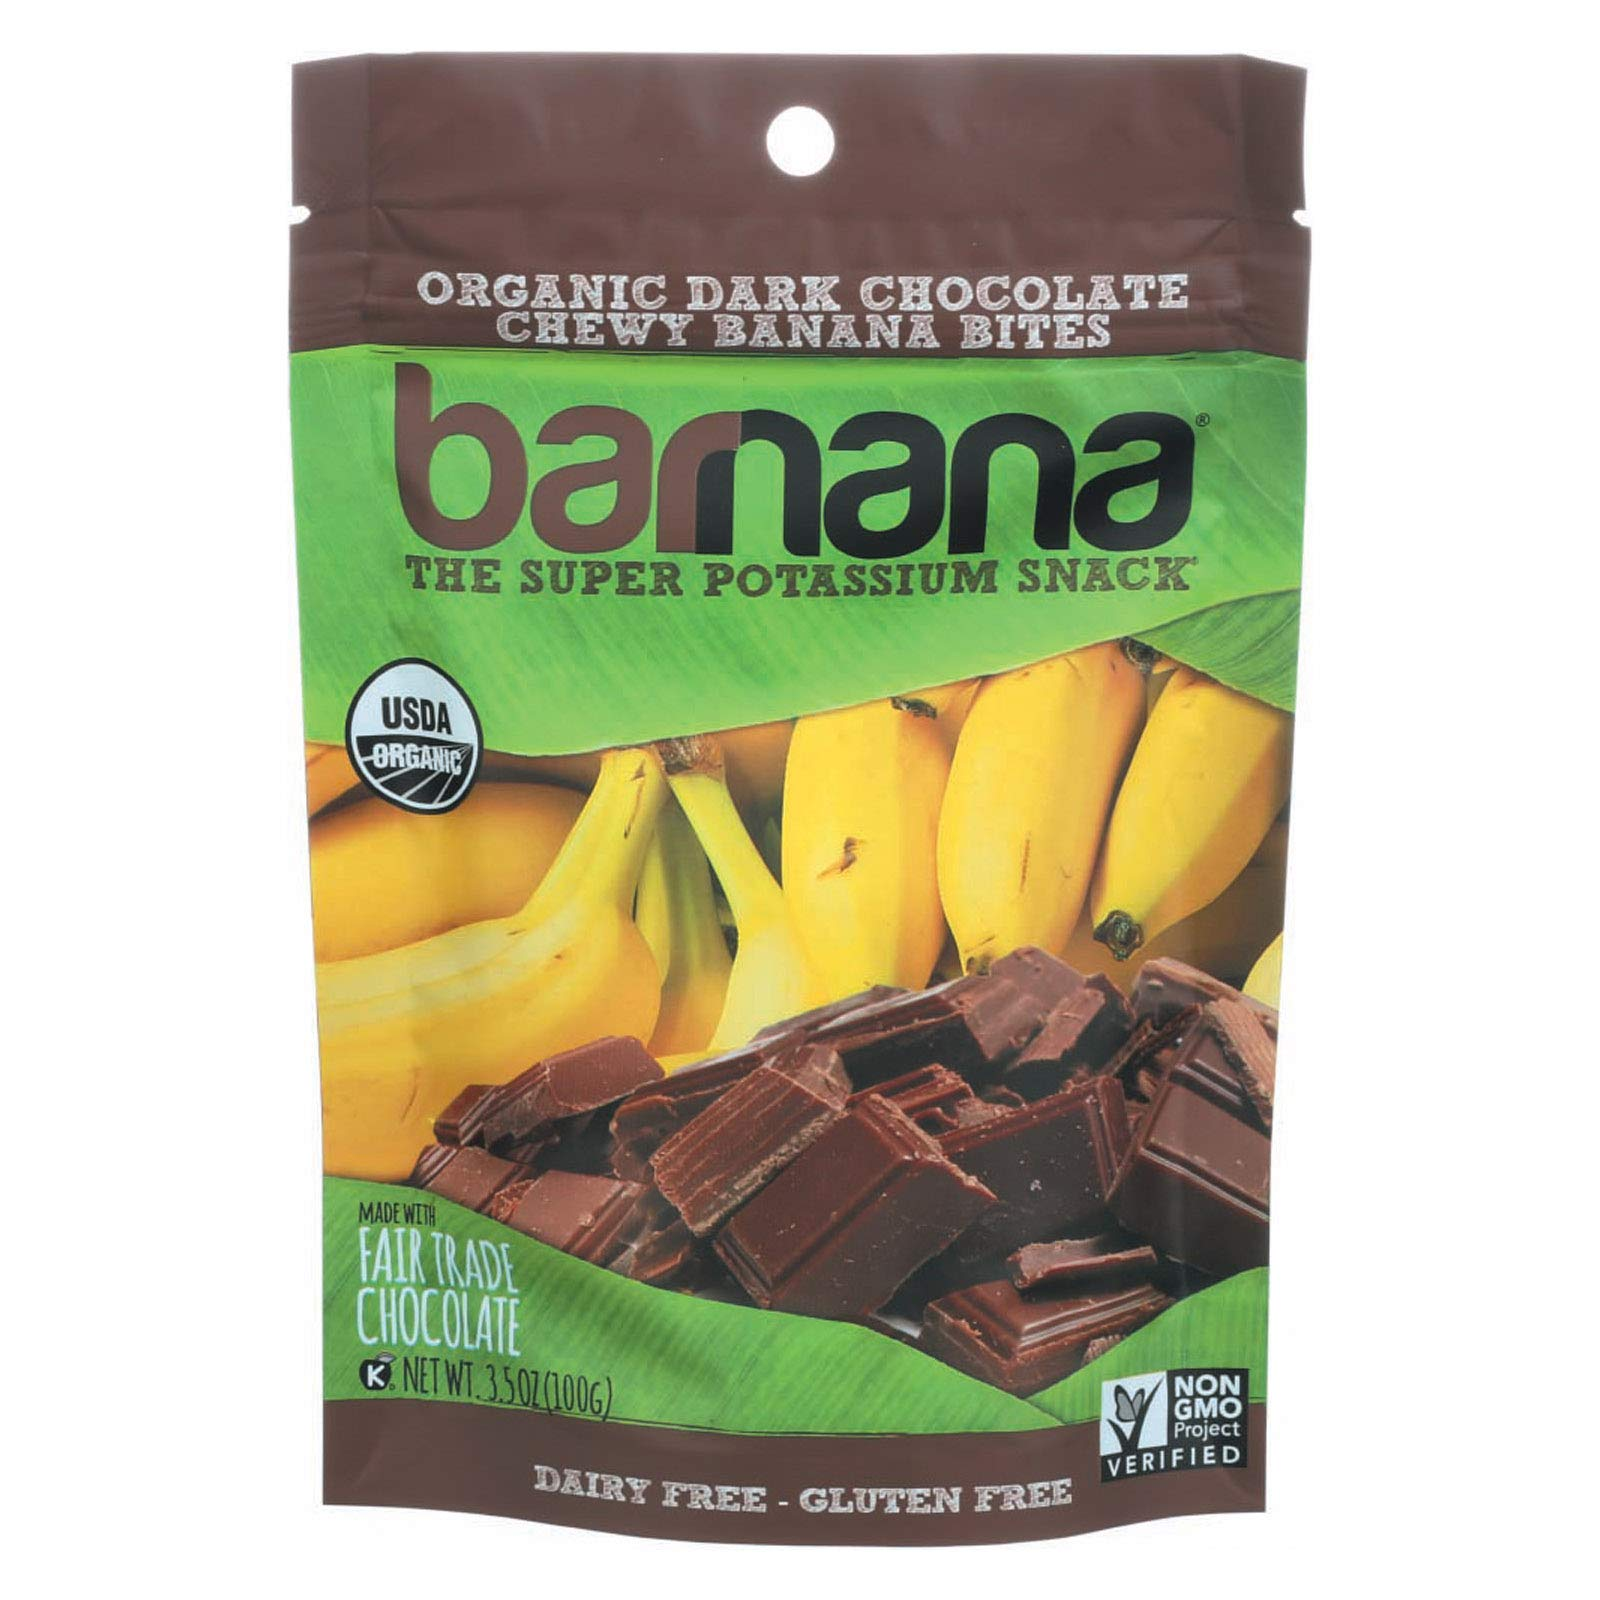 Barnana Organic Chocolate Chewy Banana Bites, 3.5 Ounce - 12 per case.